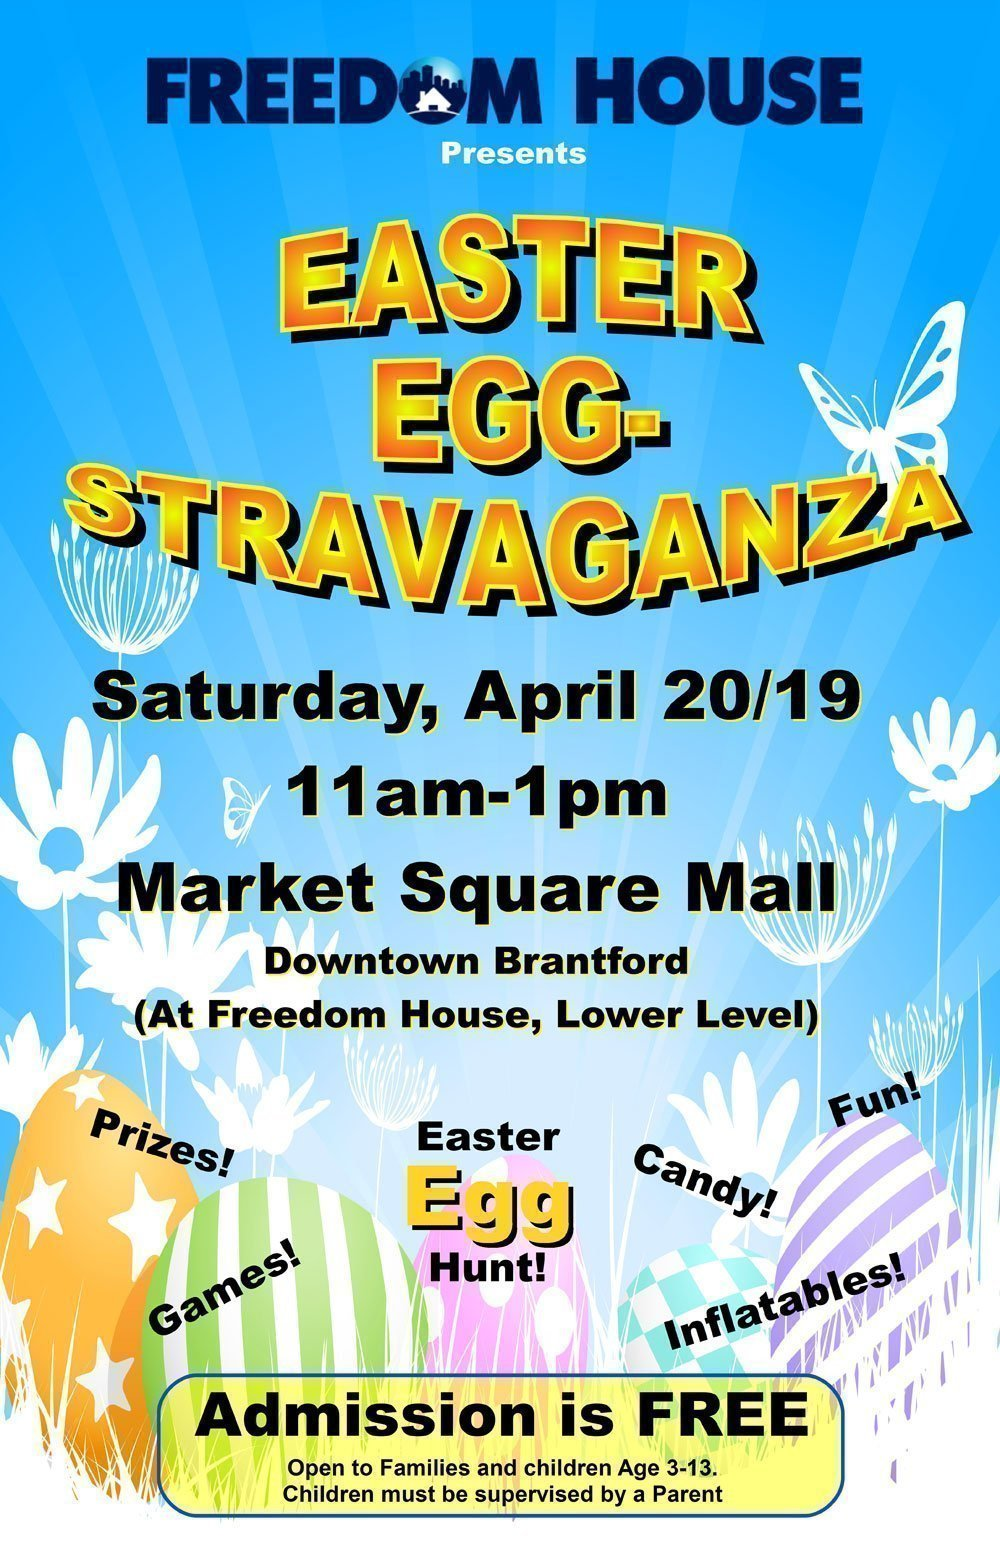 2019 Eggstravaganza - April 20th